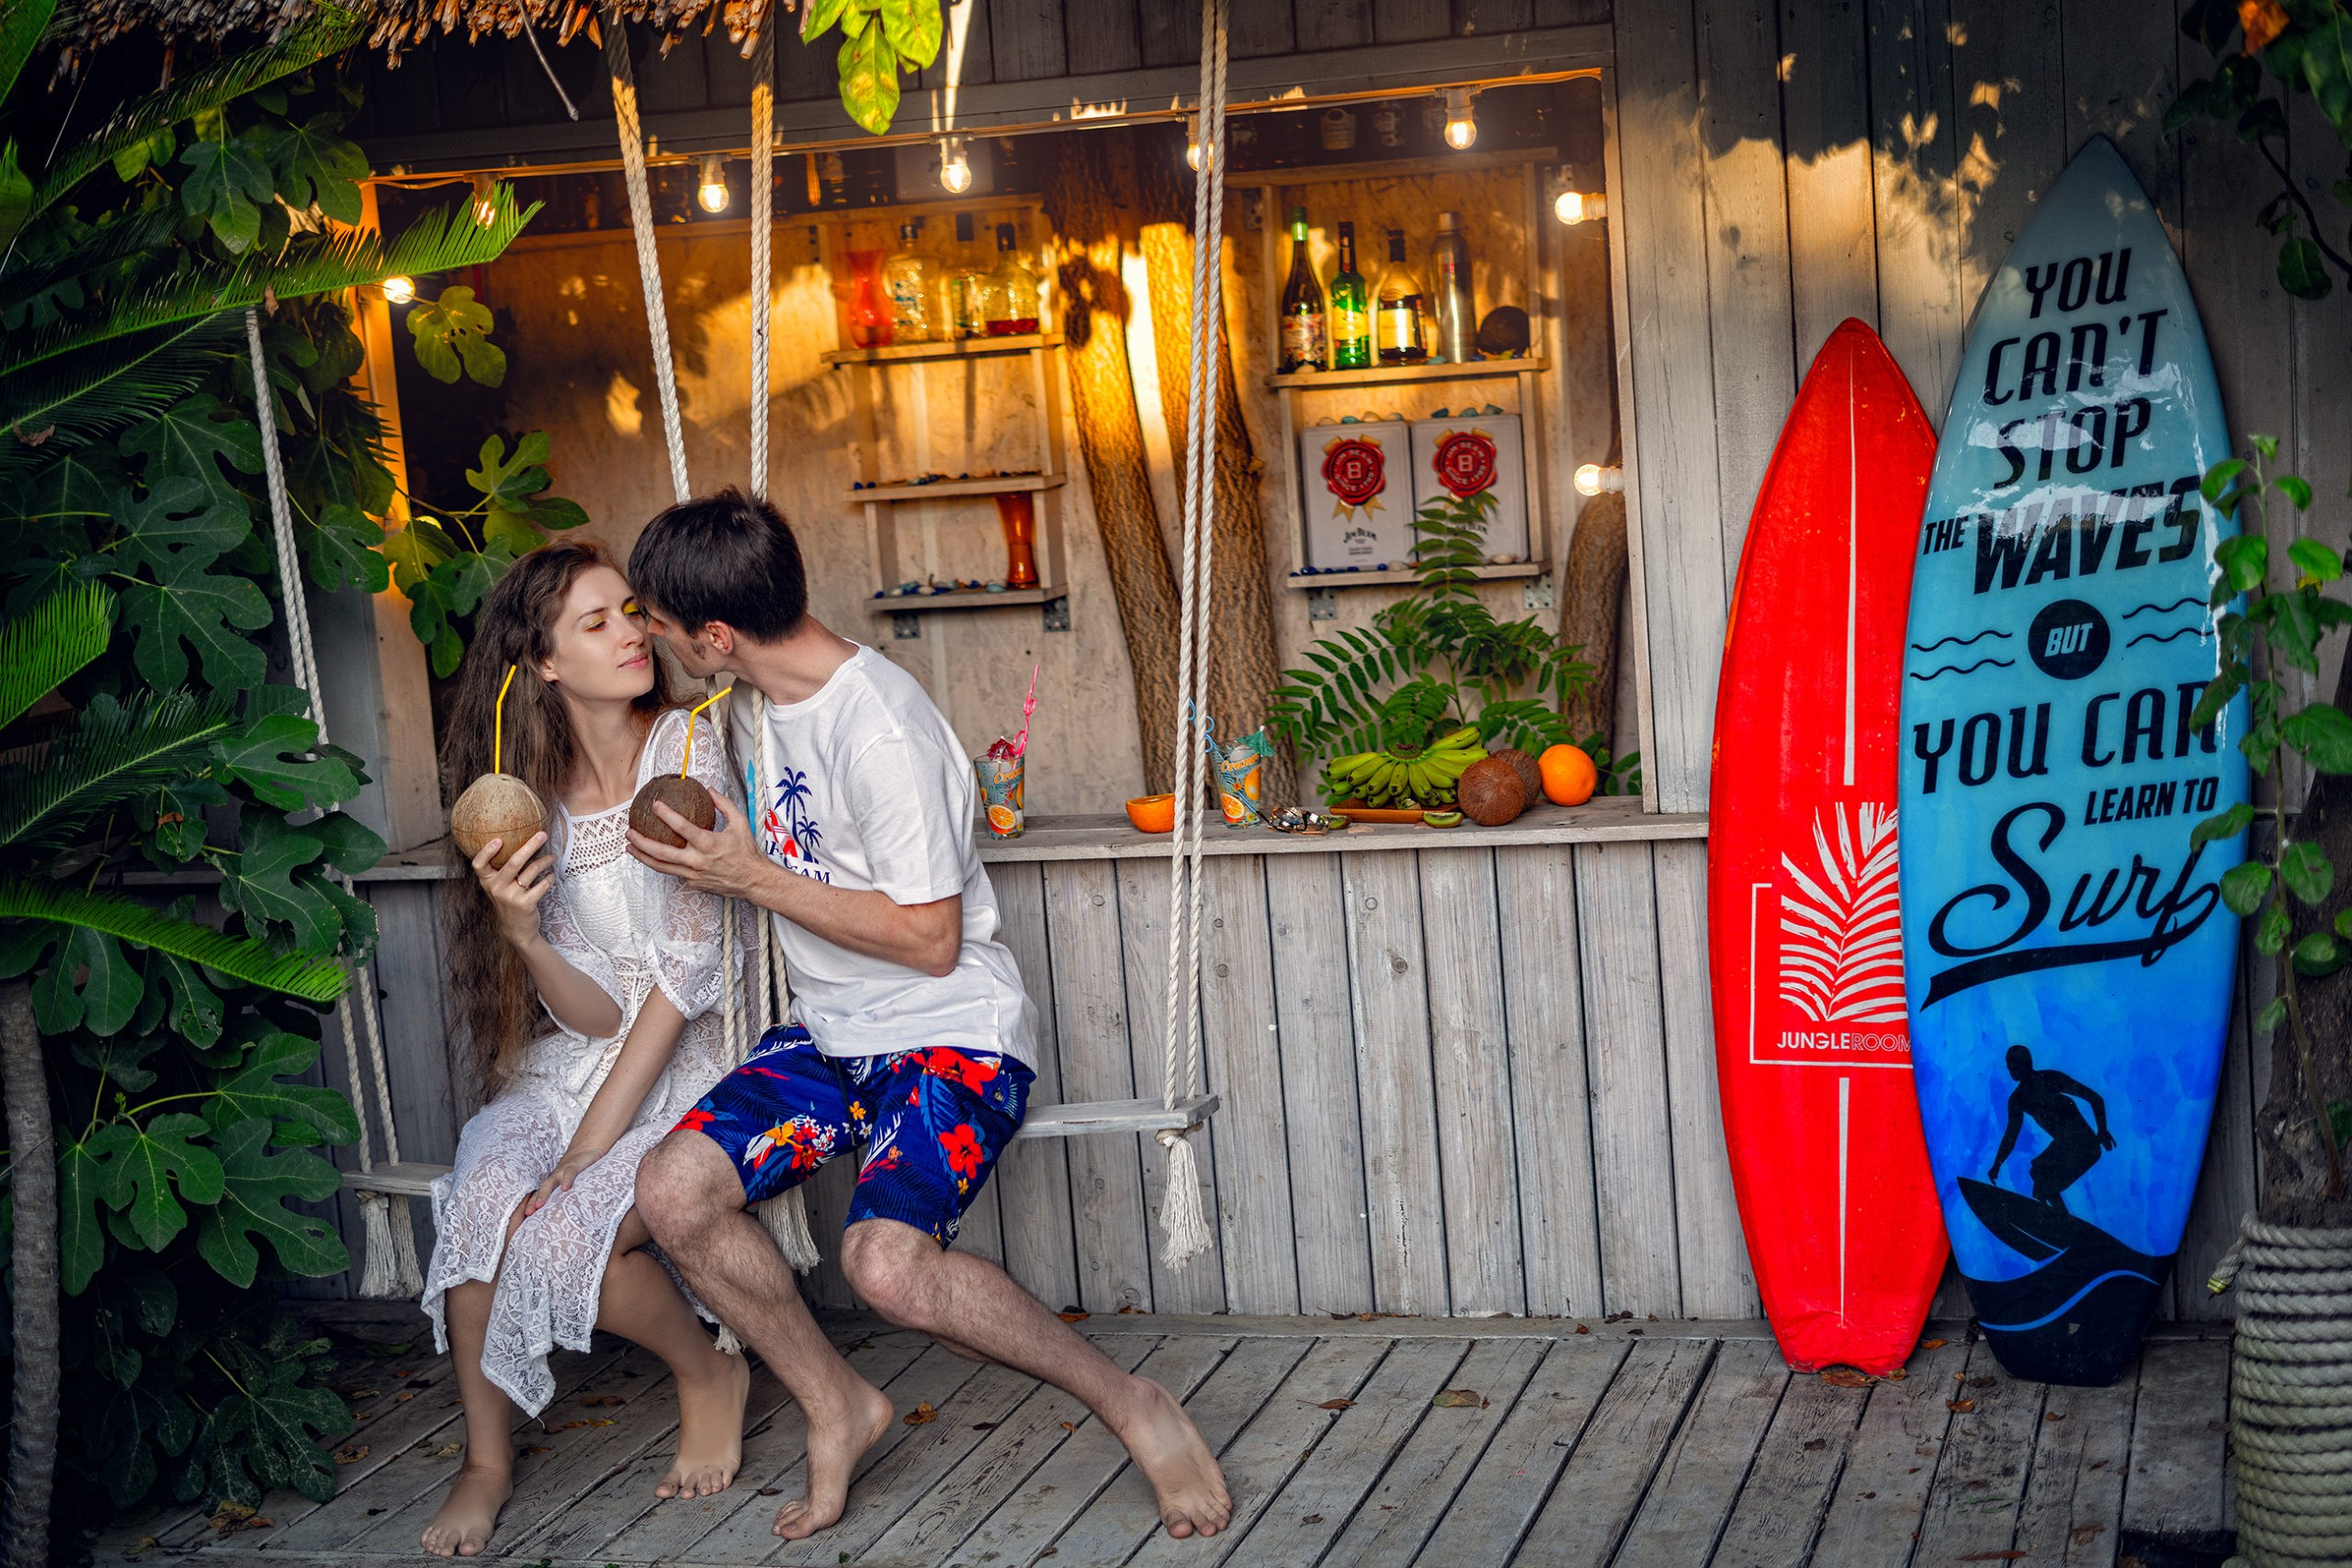 Свадебная фотосъемка в Краснодаре, свадьба на отдыхе, свадьба у моря, свадьба Бали